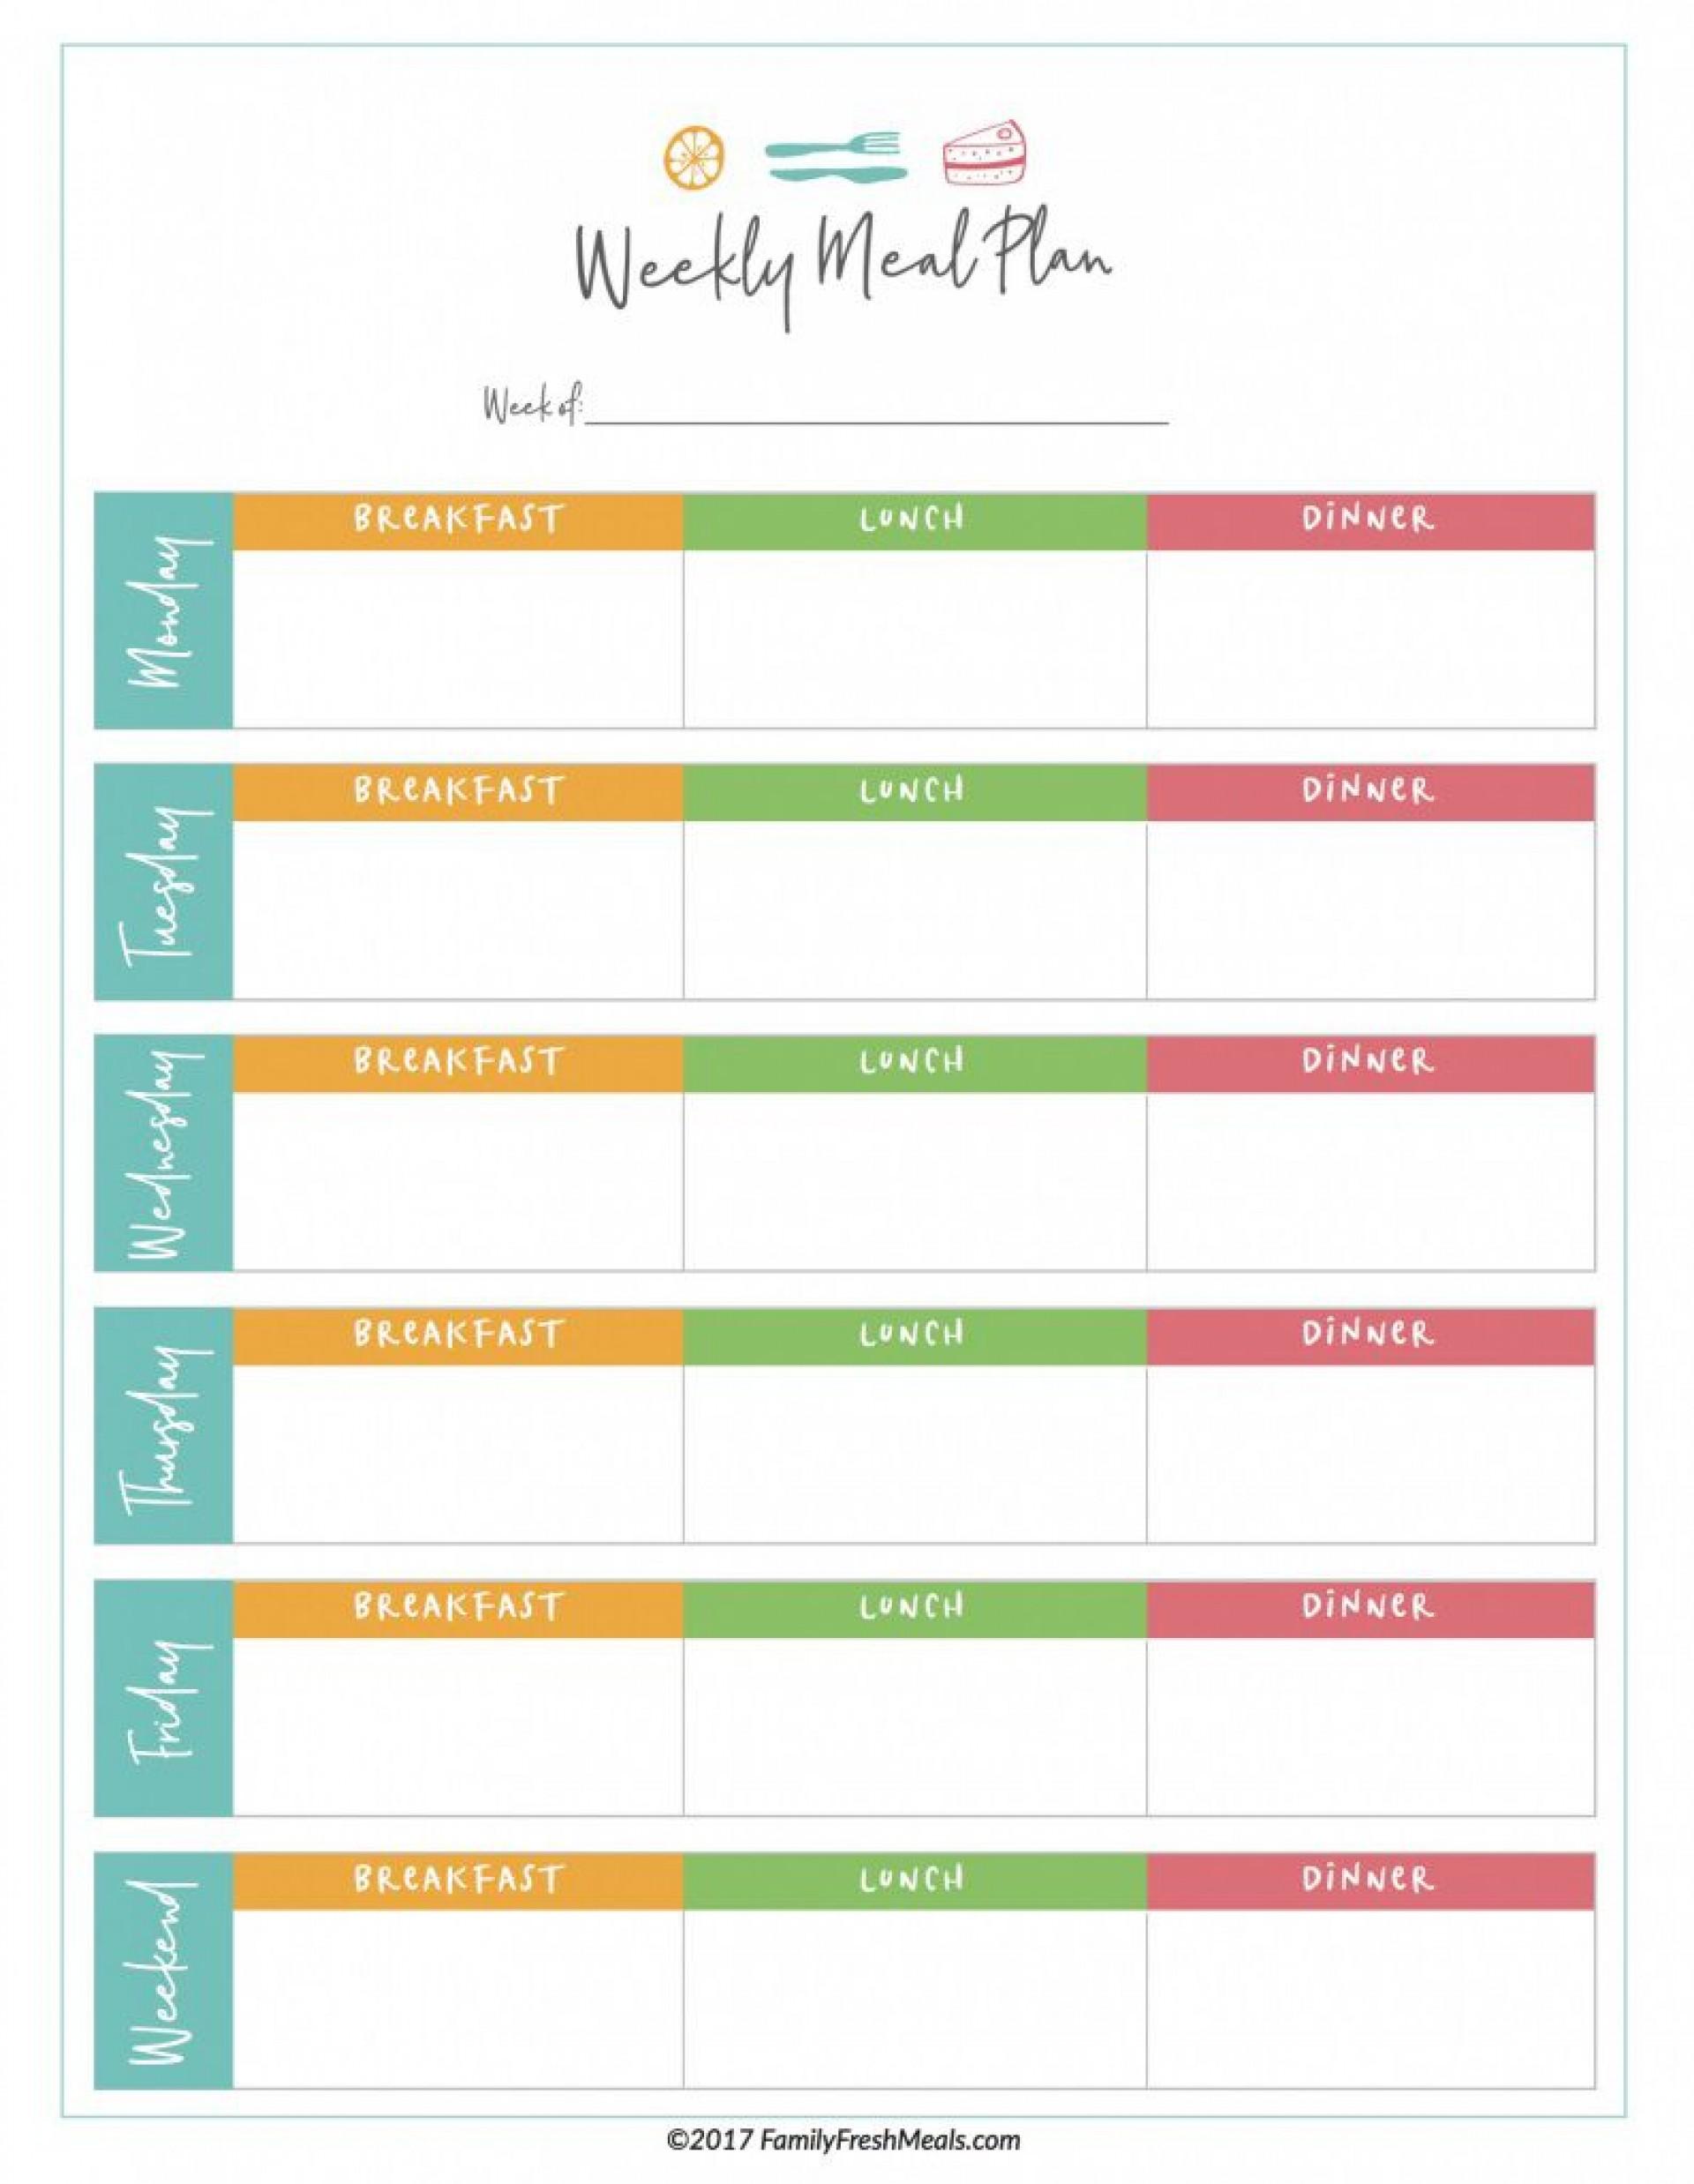 005 Remarkable Meal Plan Template Pdf Inspiration  Printable Diabetic Sample Weekly Planning Worksheet1920